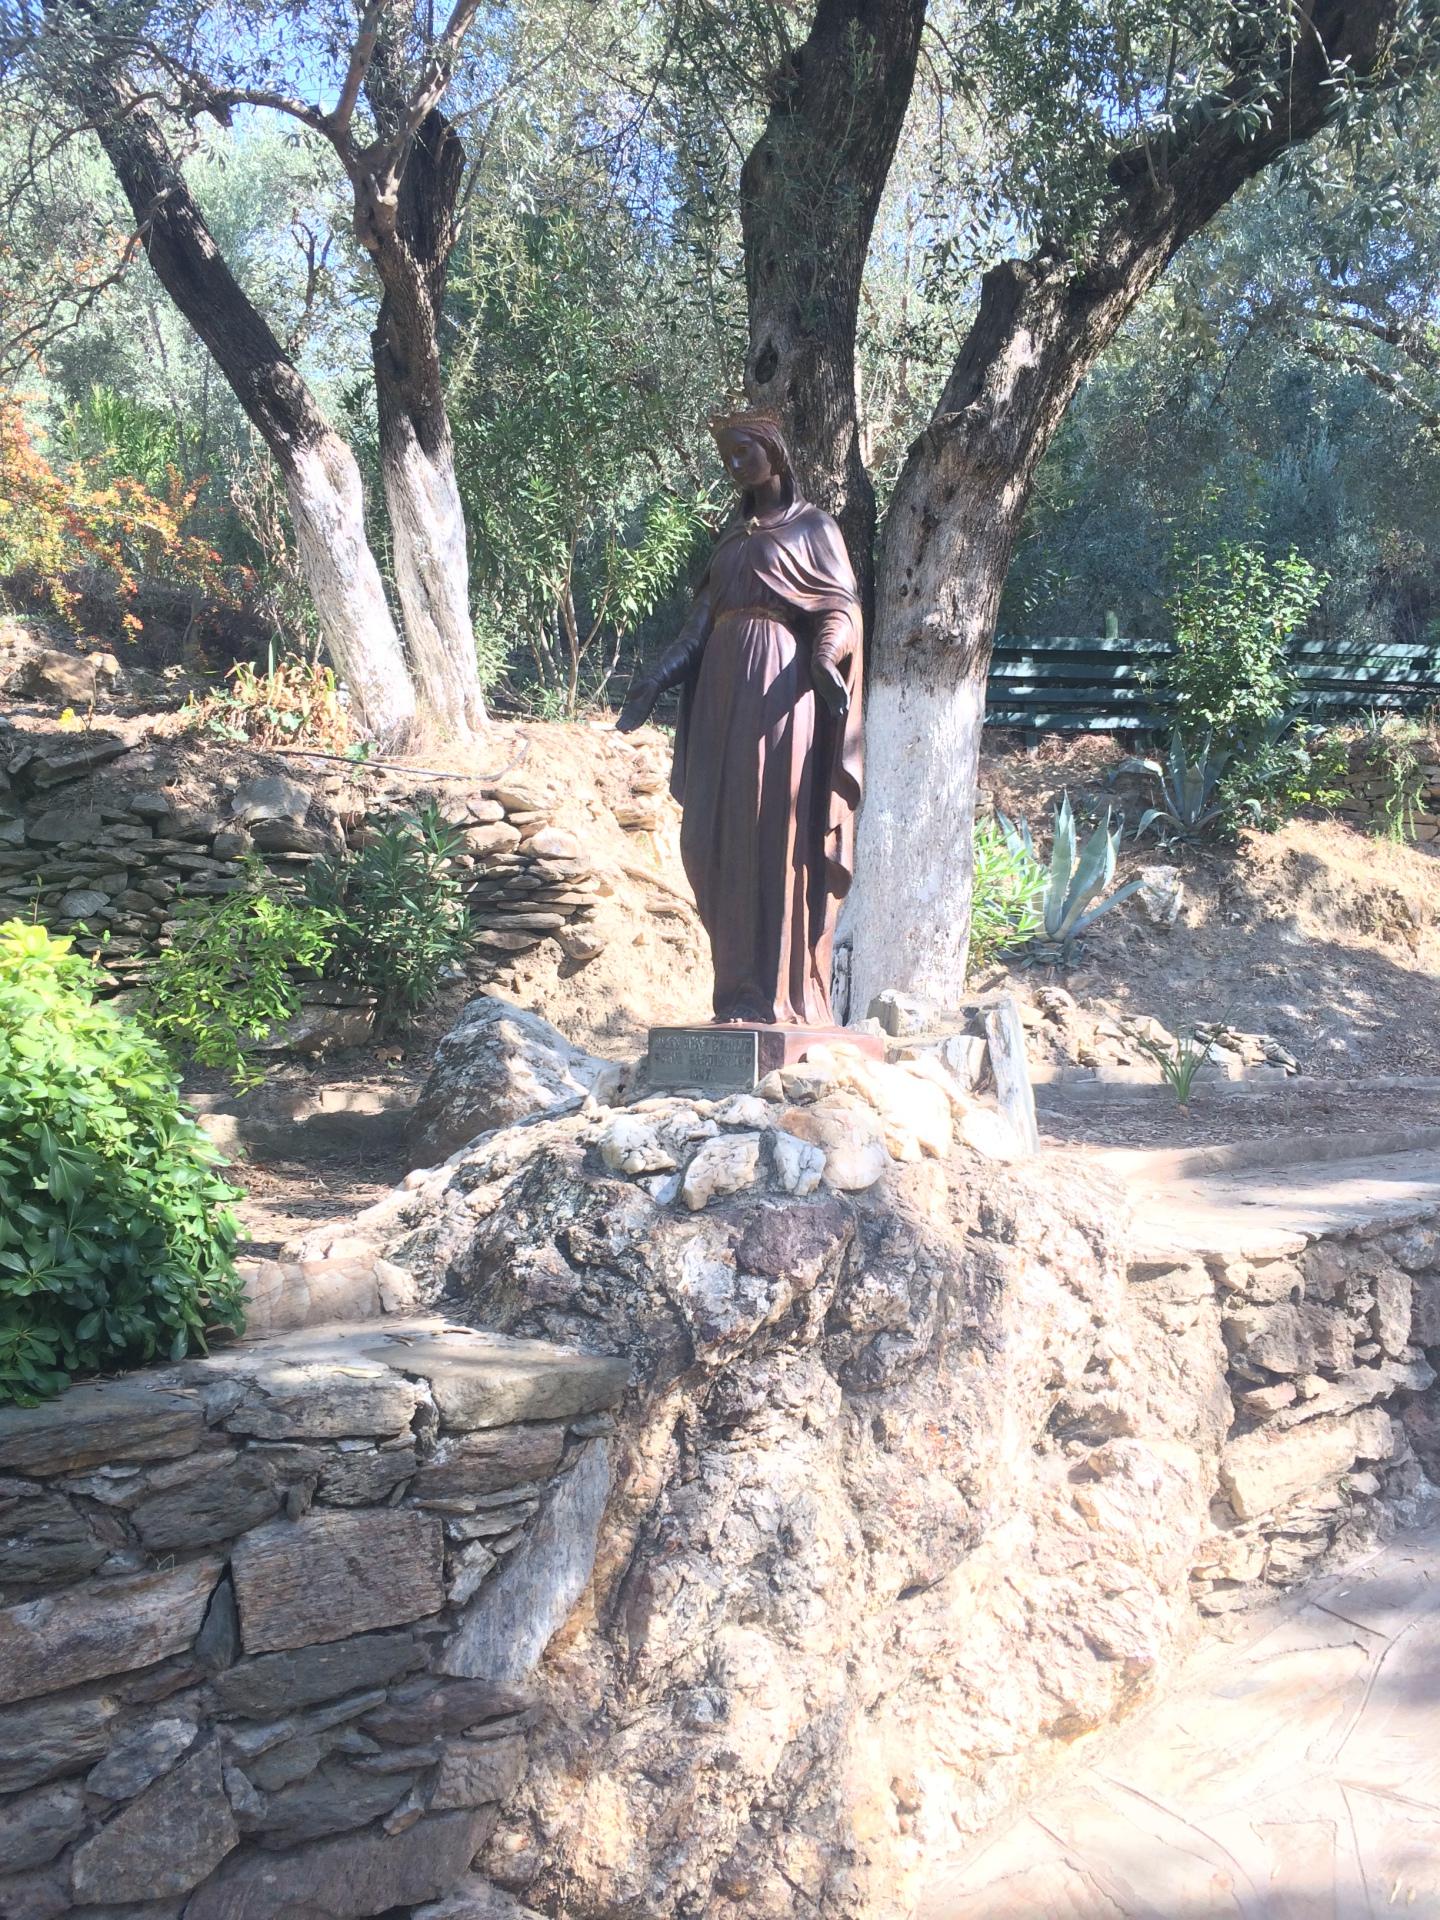 House of Virgin Mary, Mary's House in Selcuk, House of Virgin Mary in Ephesus, Mary's House, Virgin Mary's House, Meryem Ana Evi